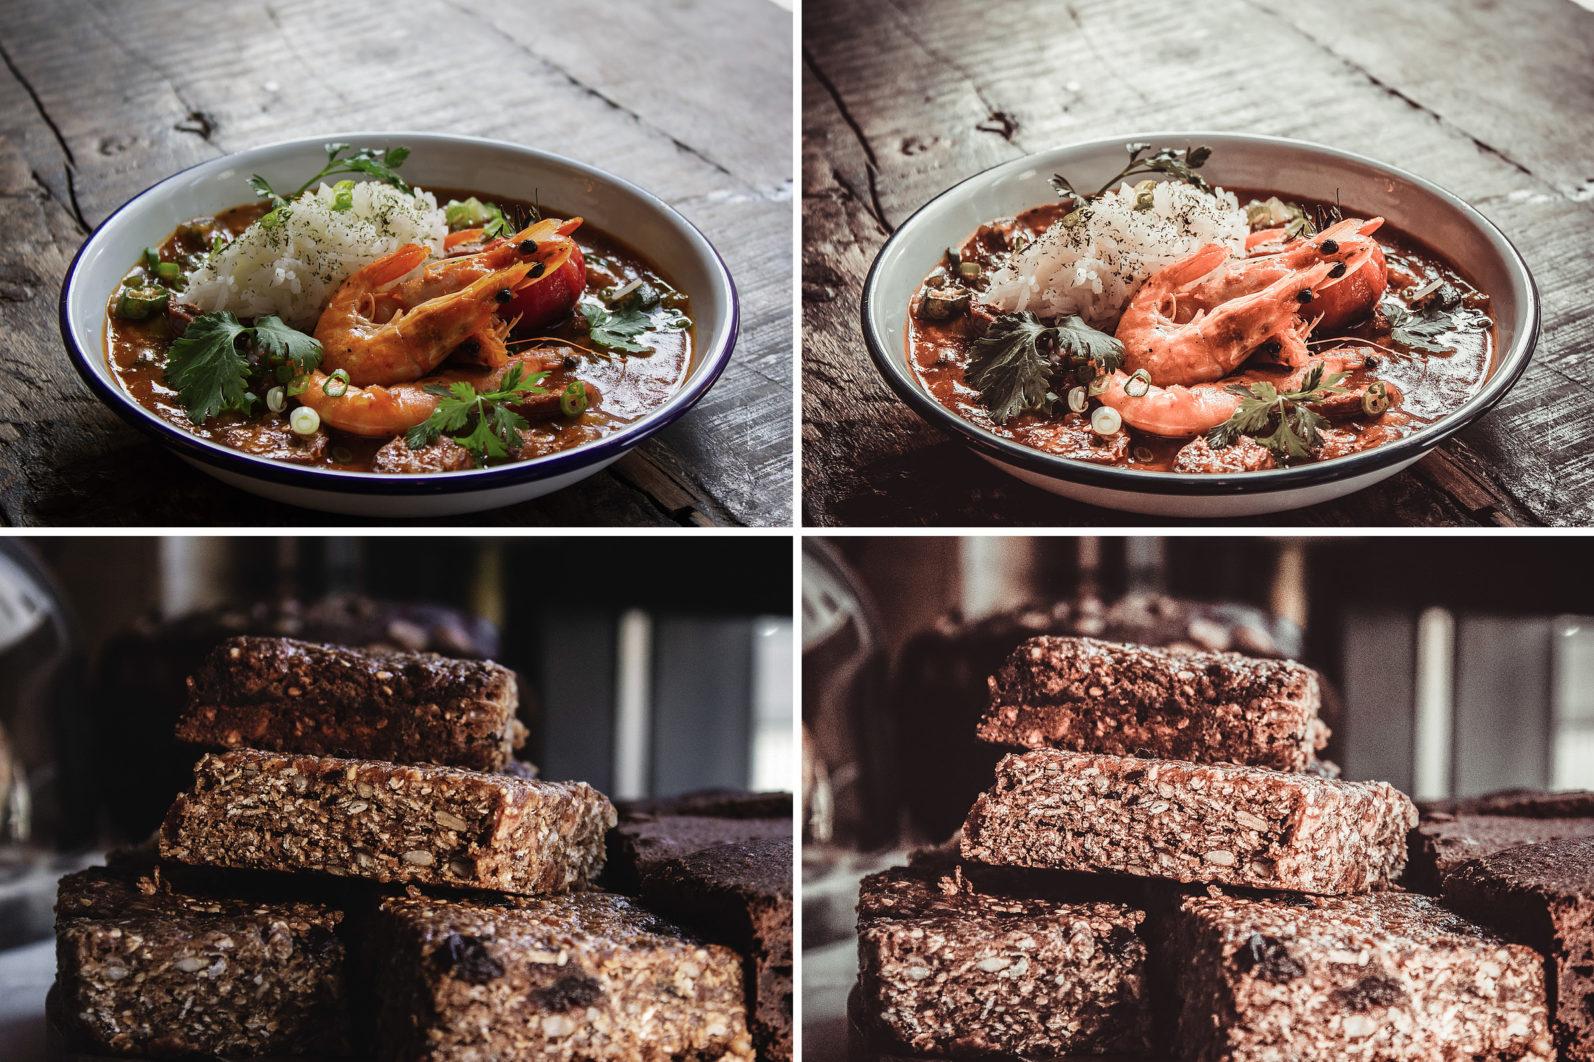 58. Rustic Food - 58.RUSTIC FOOD 08 -